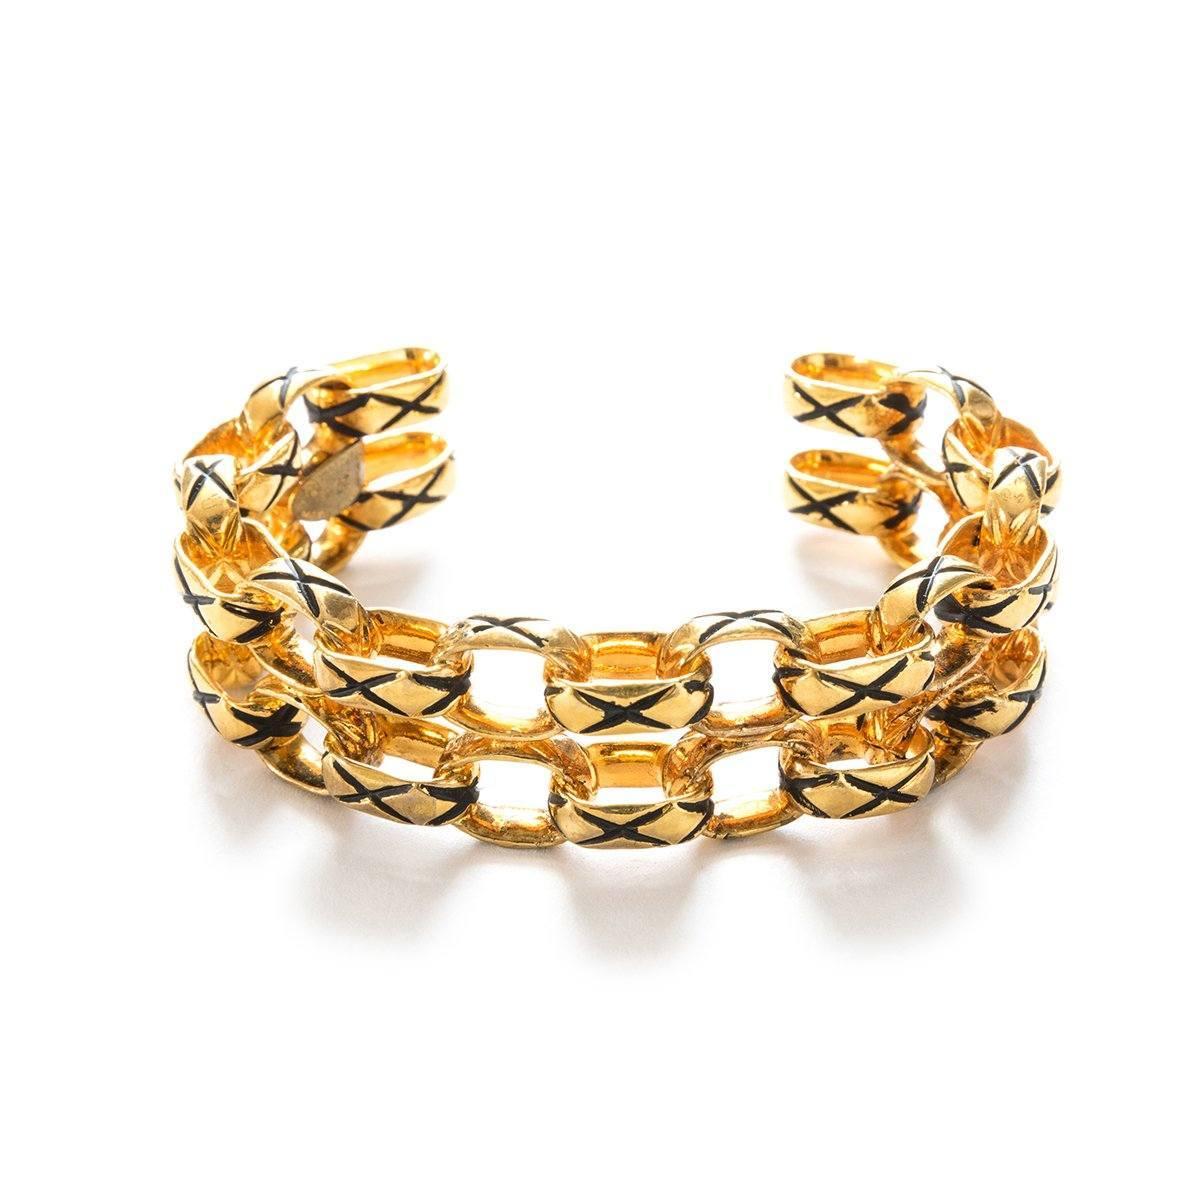 VIntage 80s Chanel Gold Plated Link Cuff Bracelet